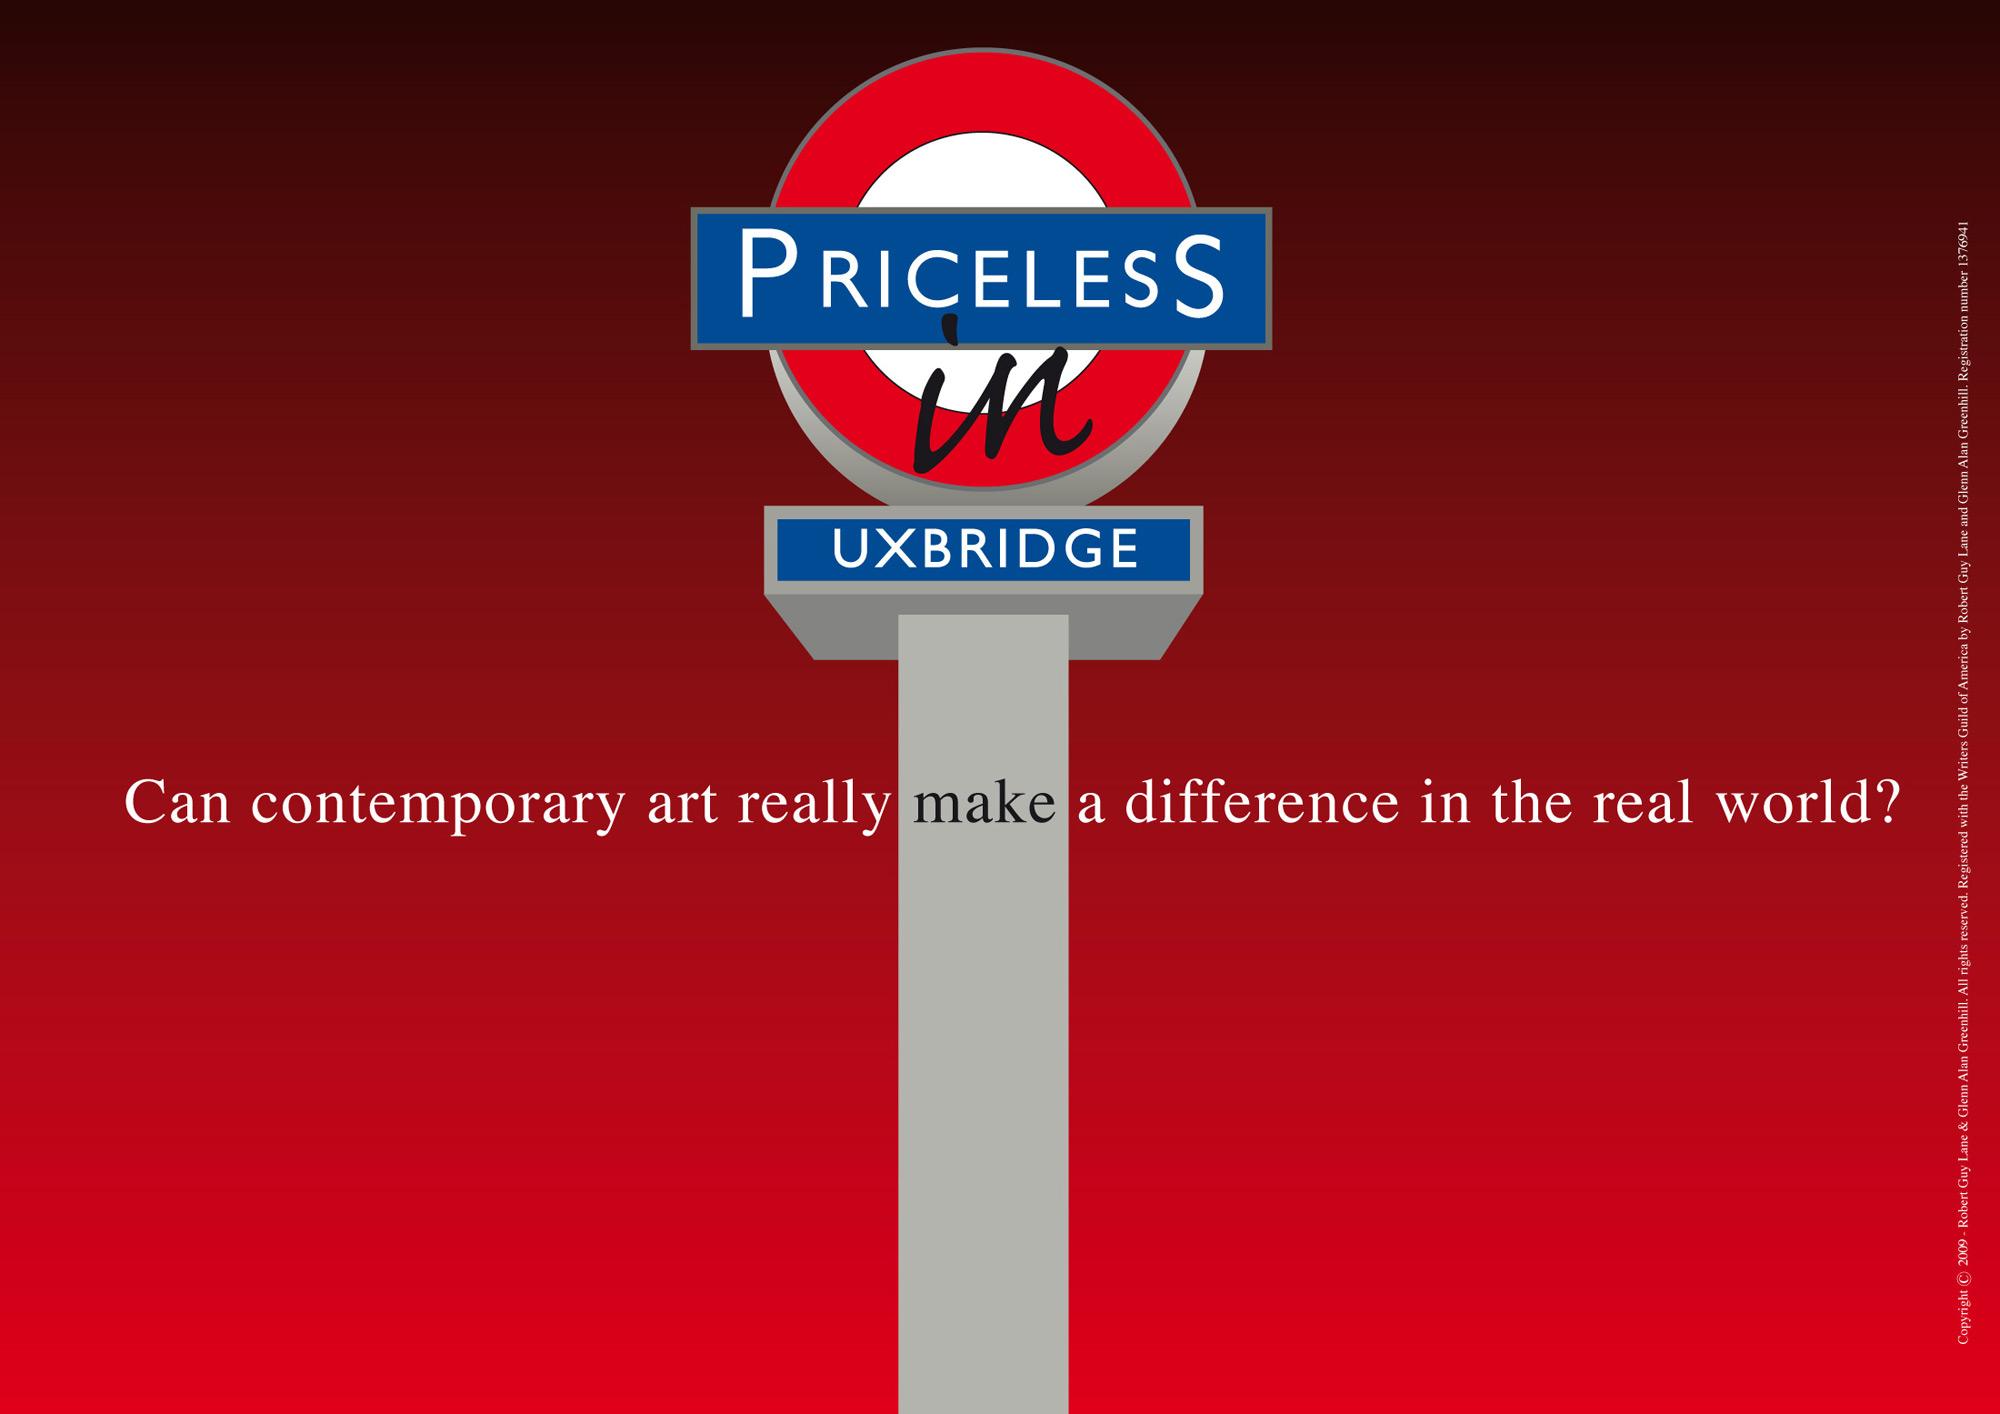 priceless_in_uxbridge_01b